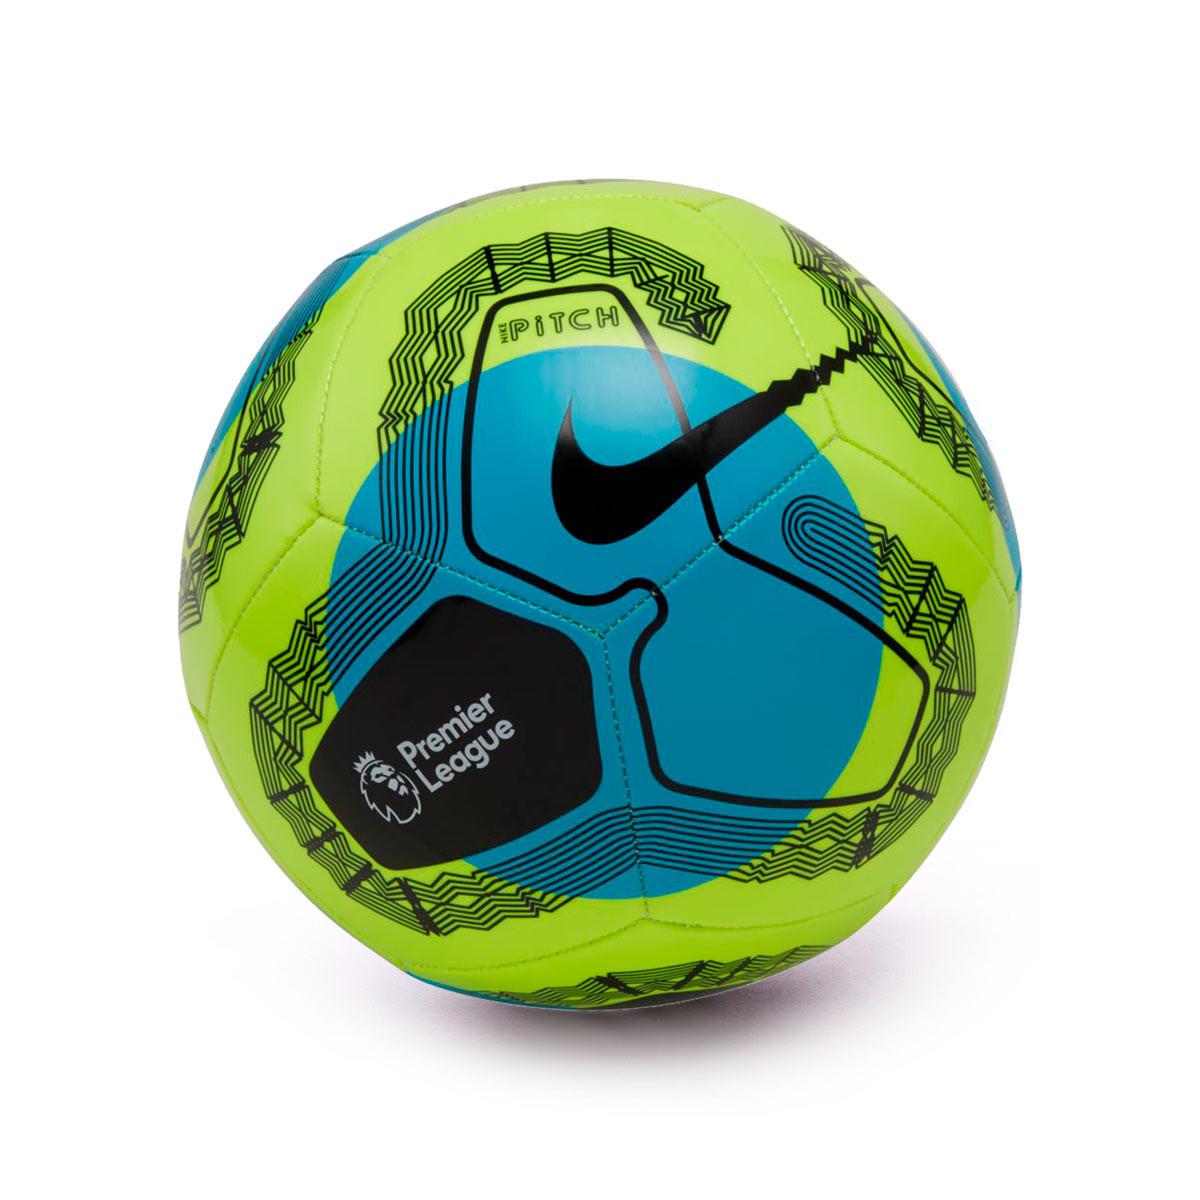 Arreglo Remisión Desafortunadamente  Ball Nike Premier League Pitch 2019-2020 Volt-Light blue-Black - Football  store Fútbol Emotion